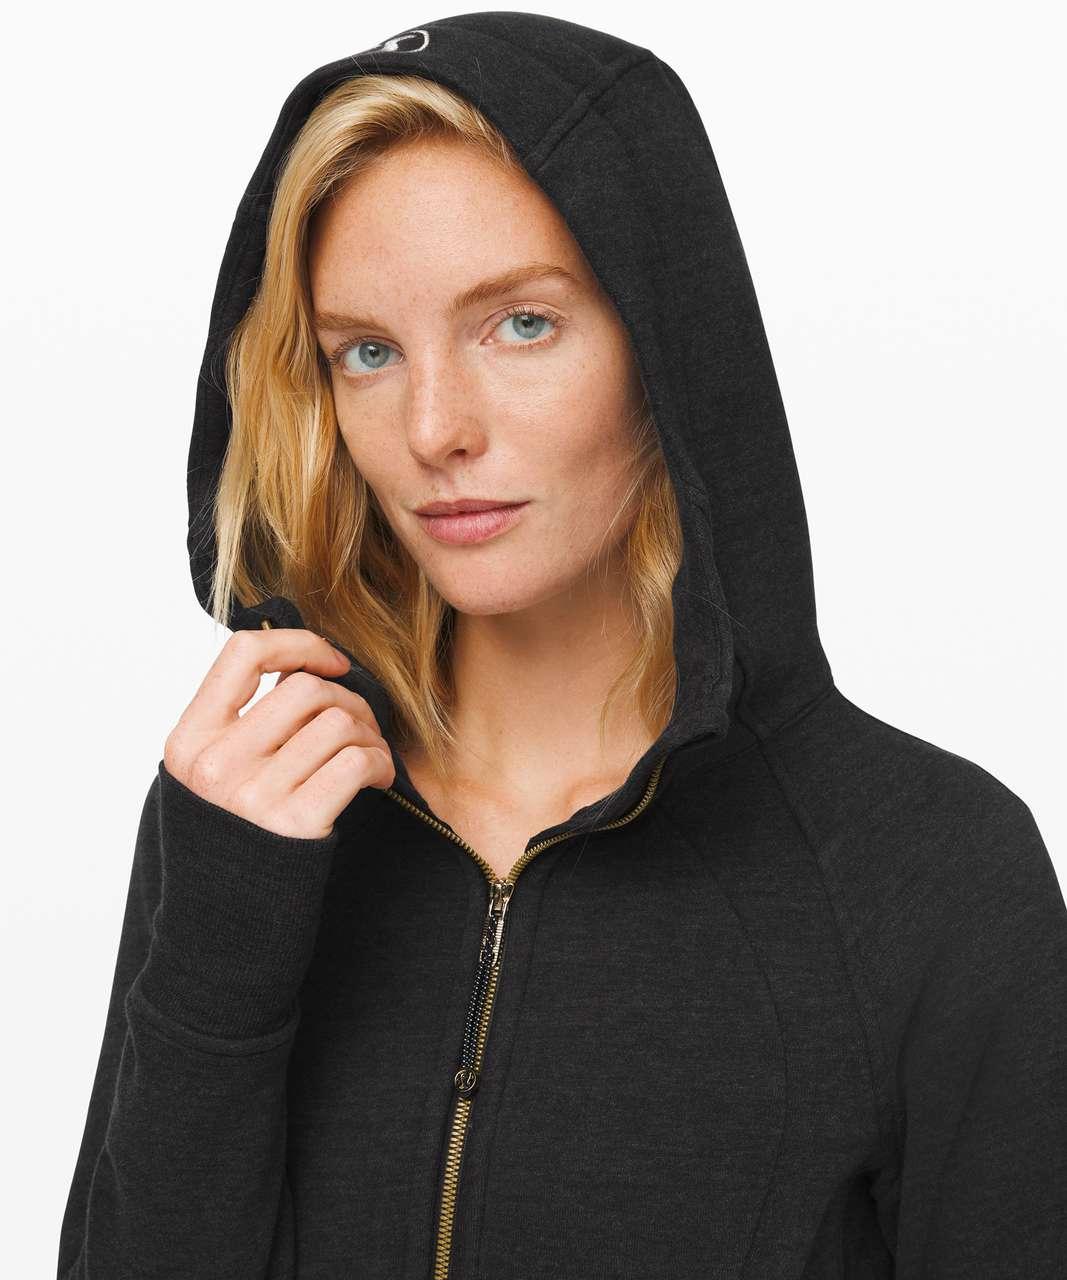 Lululemon Scuba Hoodie *Light Cotton Fleece - Heathered Core Black / Gold